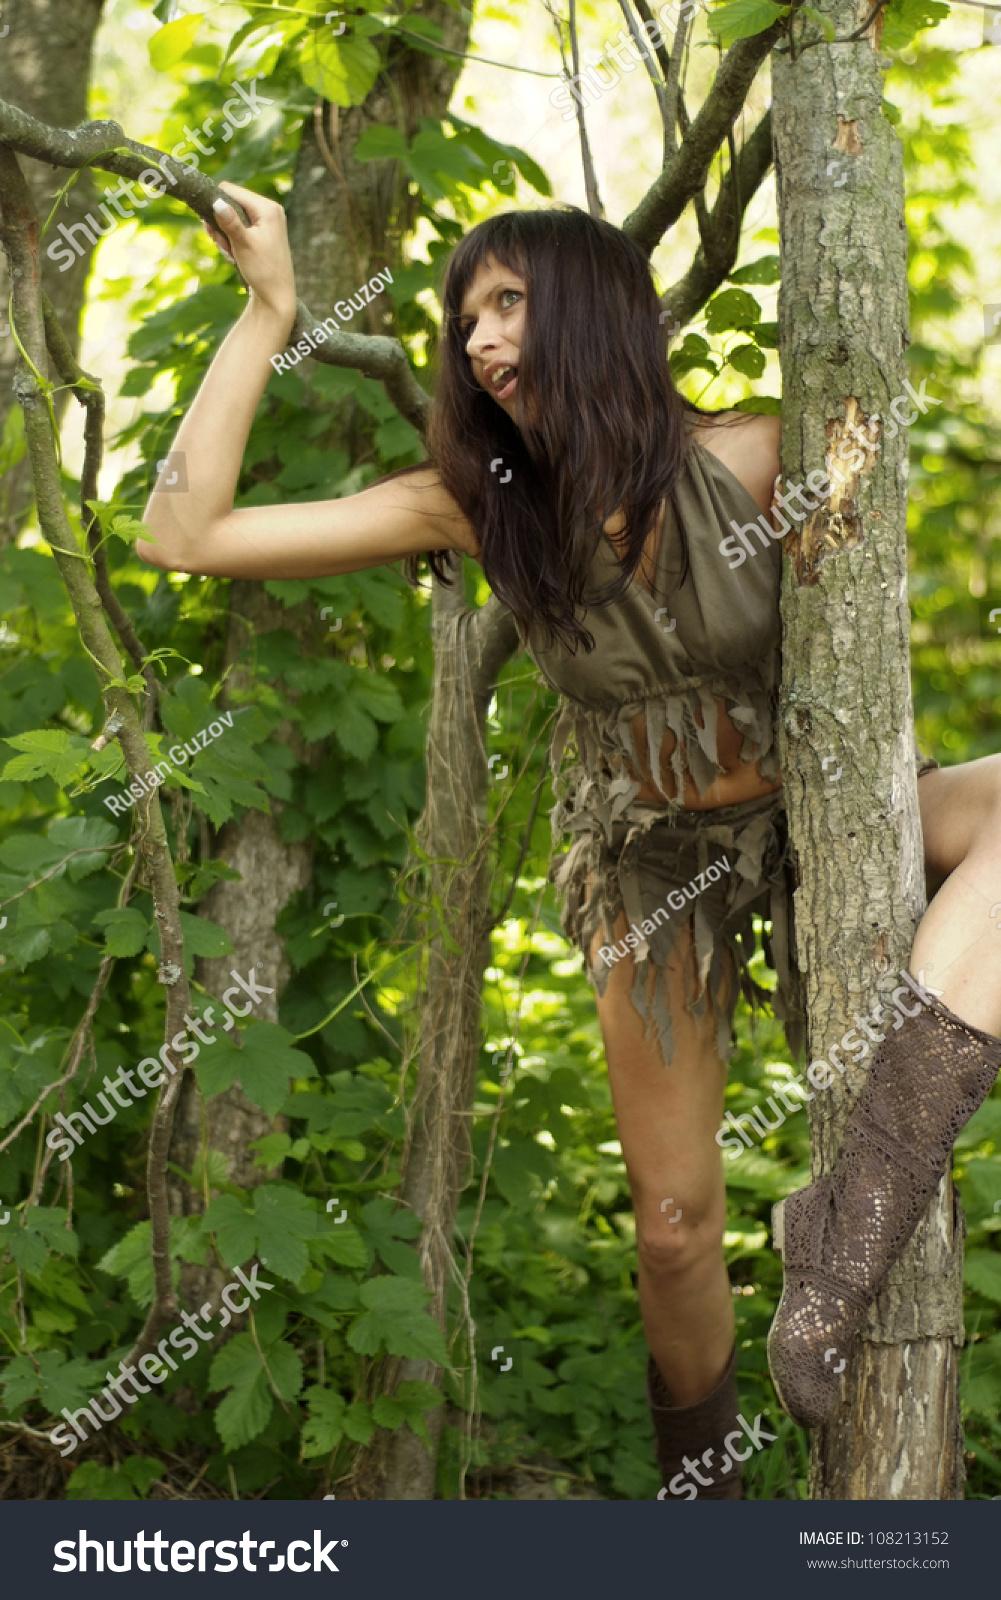 girl in loincloth stock - photo #20